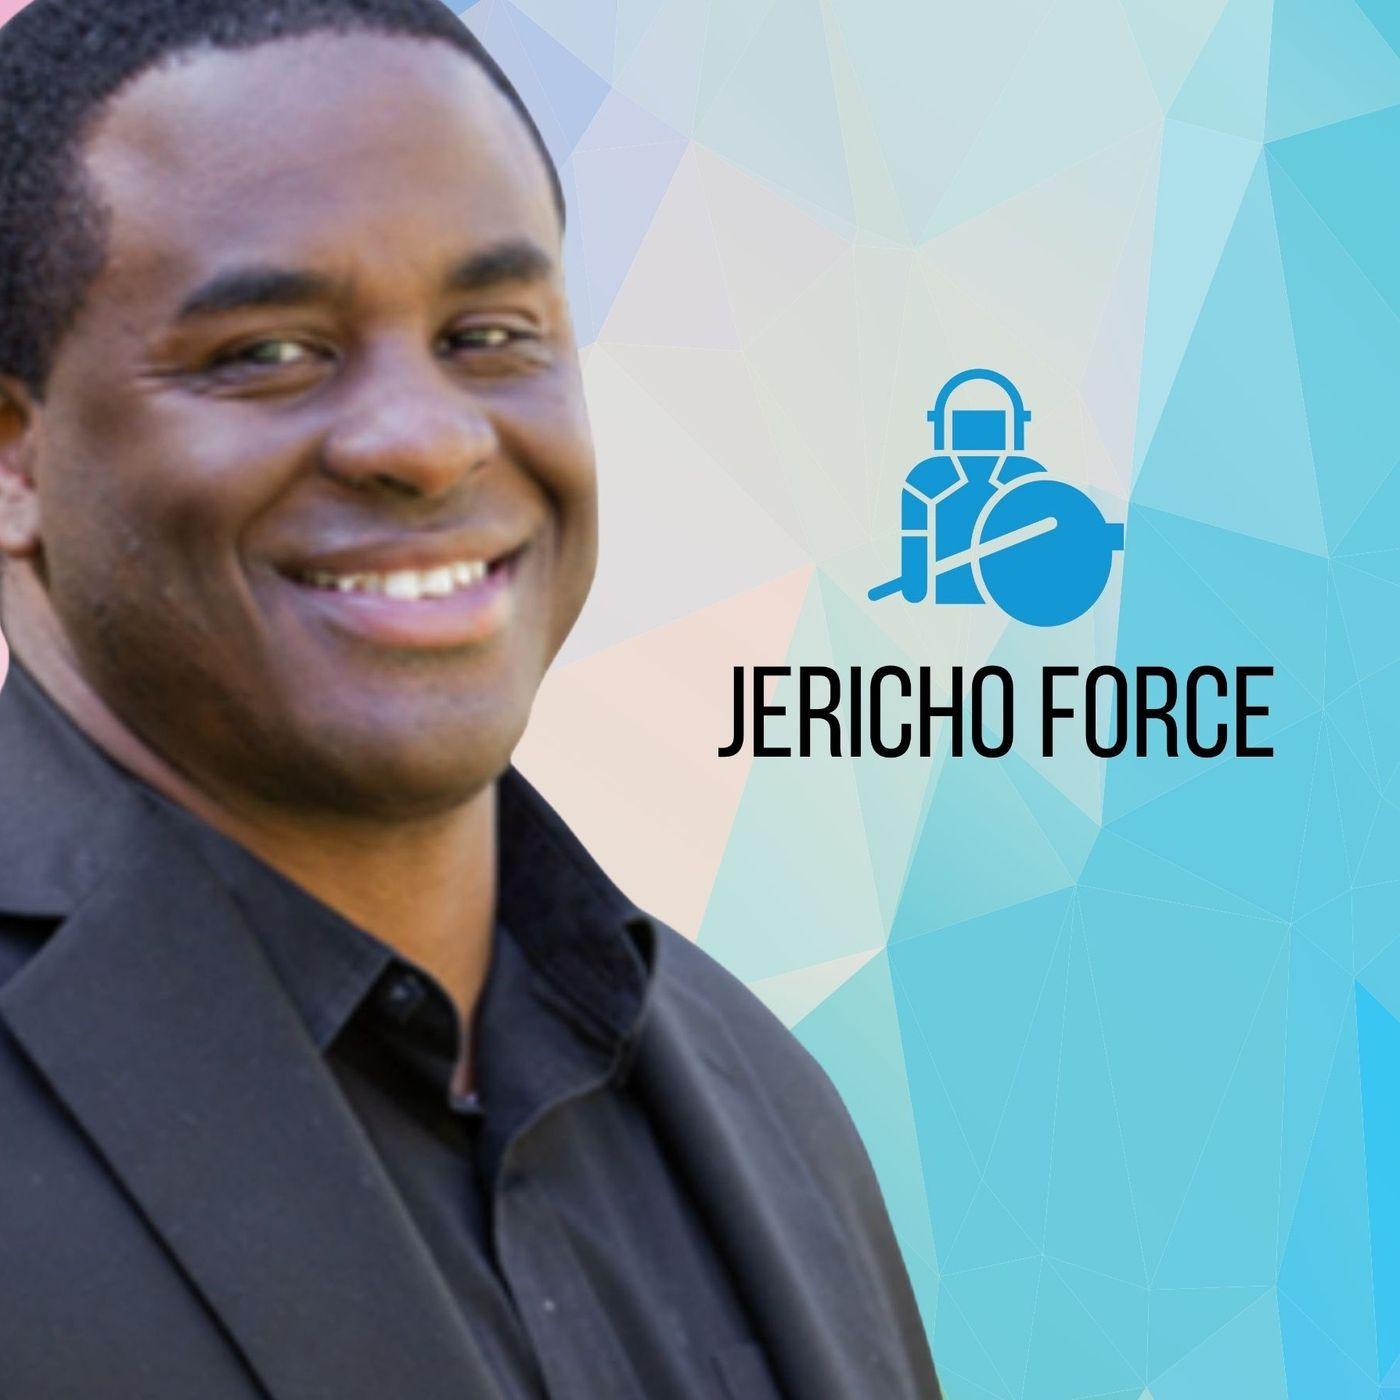 The Jericho Force Podcast with Jason Davis - EP 14 - Julie Wenger